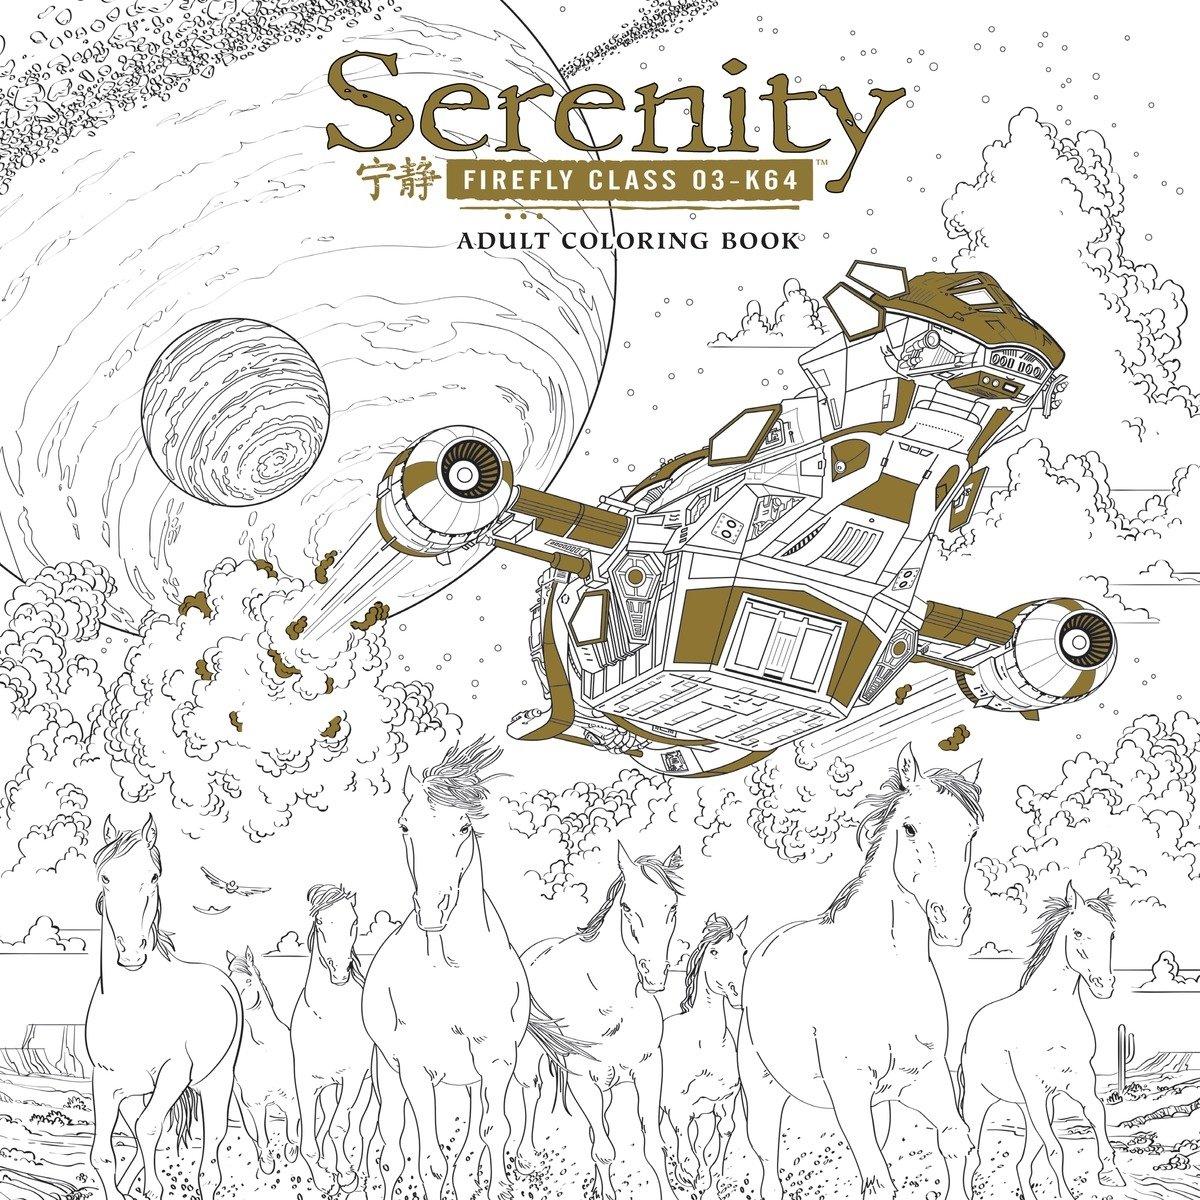 Amazon Serenity Adult Coloring Book 9781506702544 Fox Books